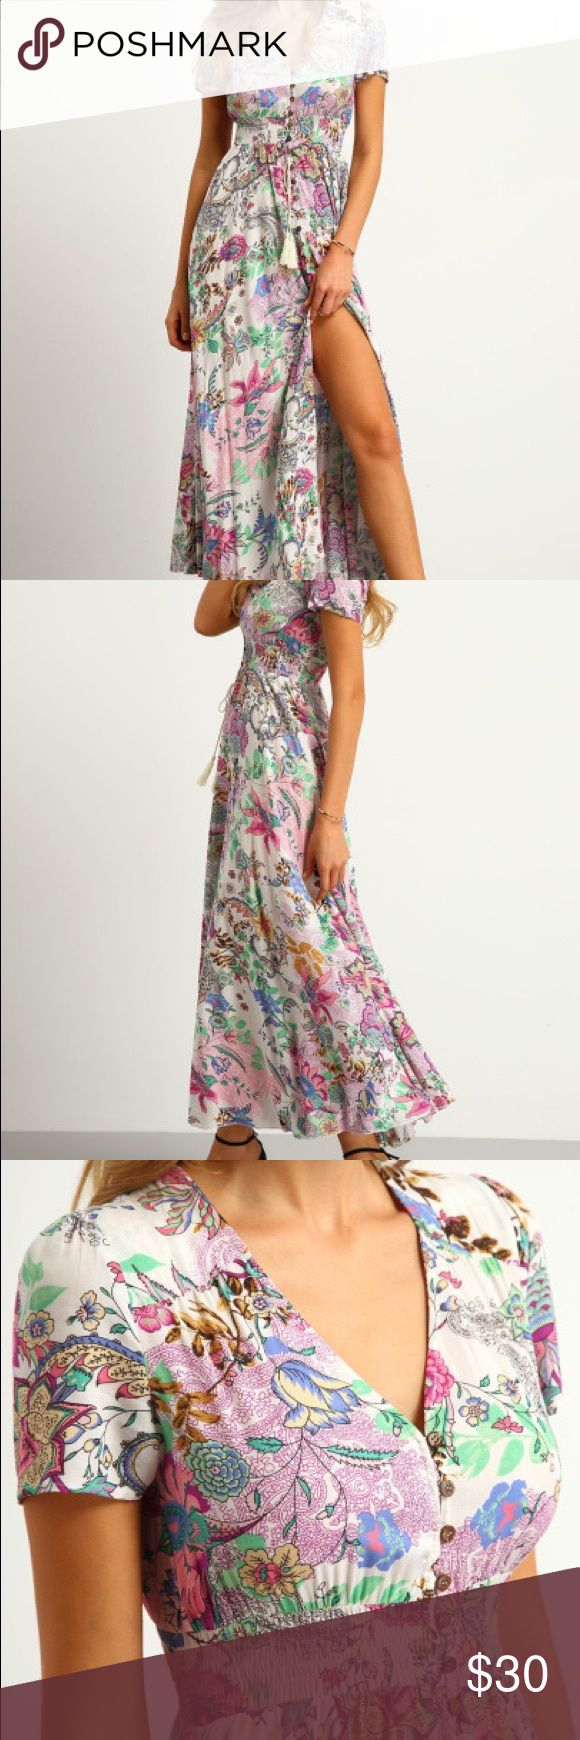 best my posh picks images on pinterest reformation dresses